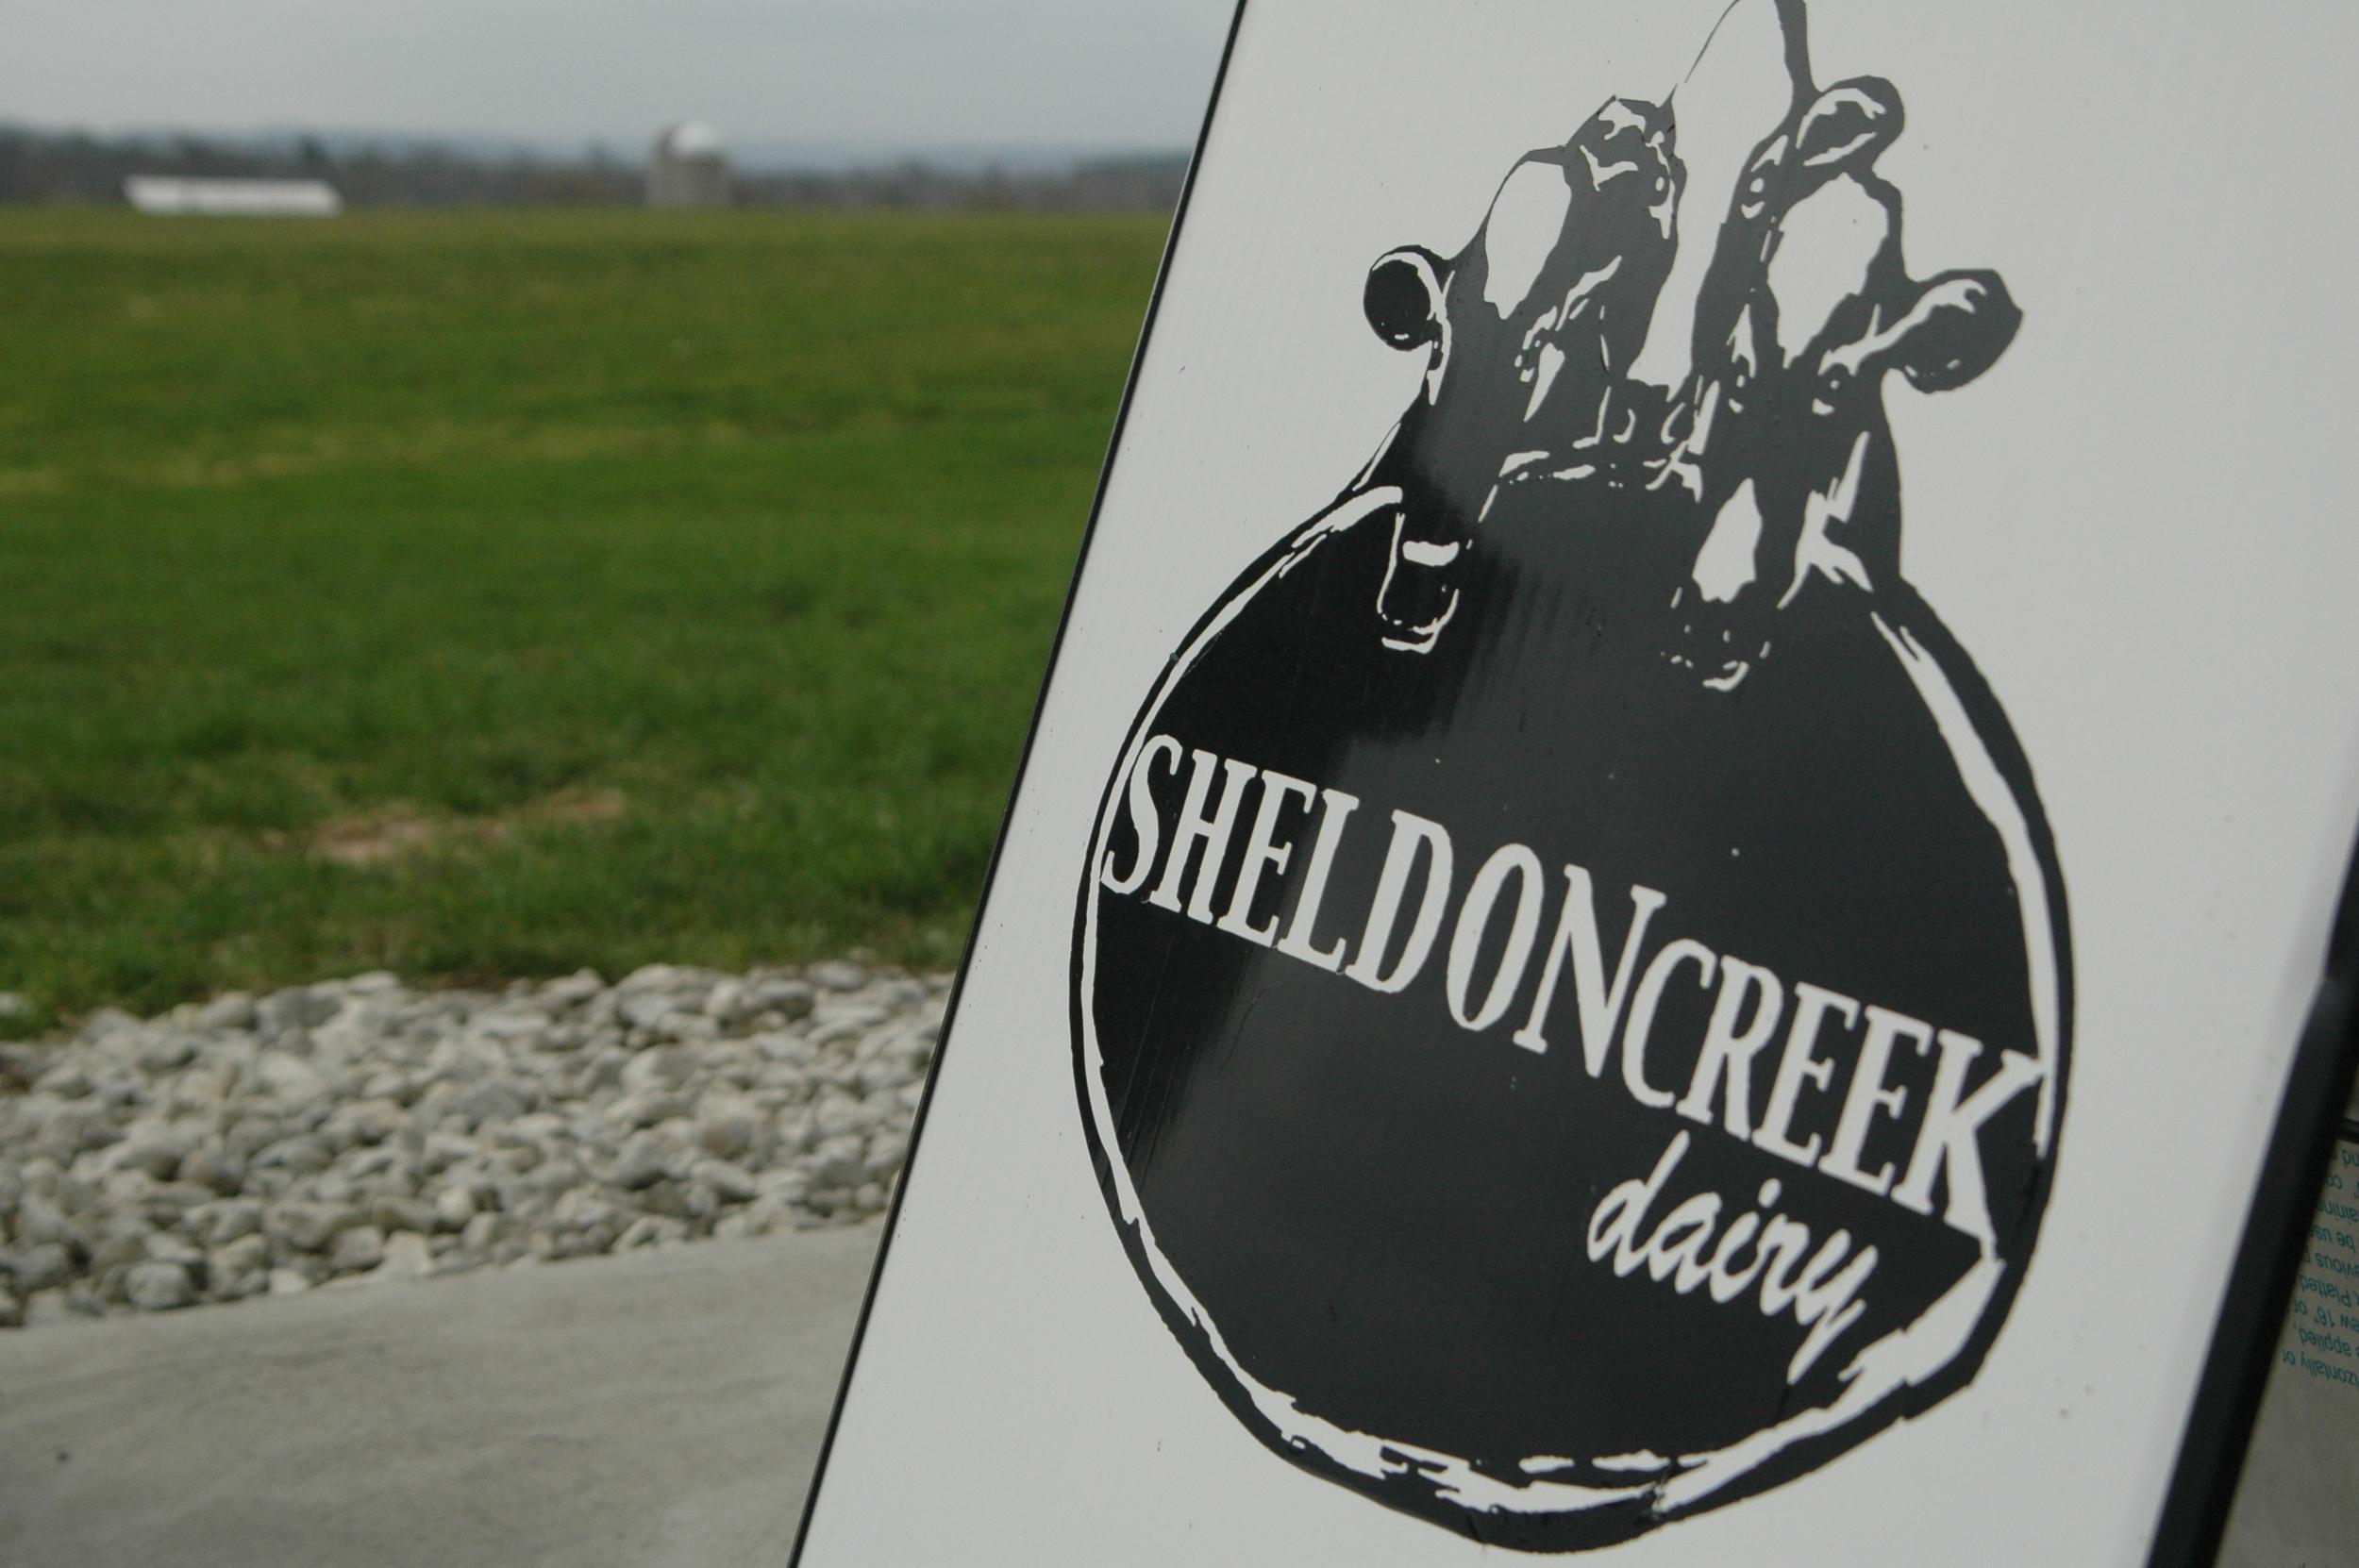 Sheldon Creek